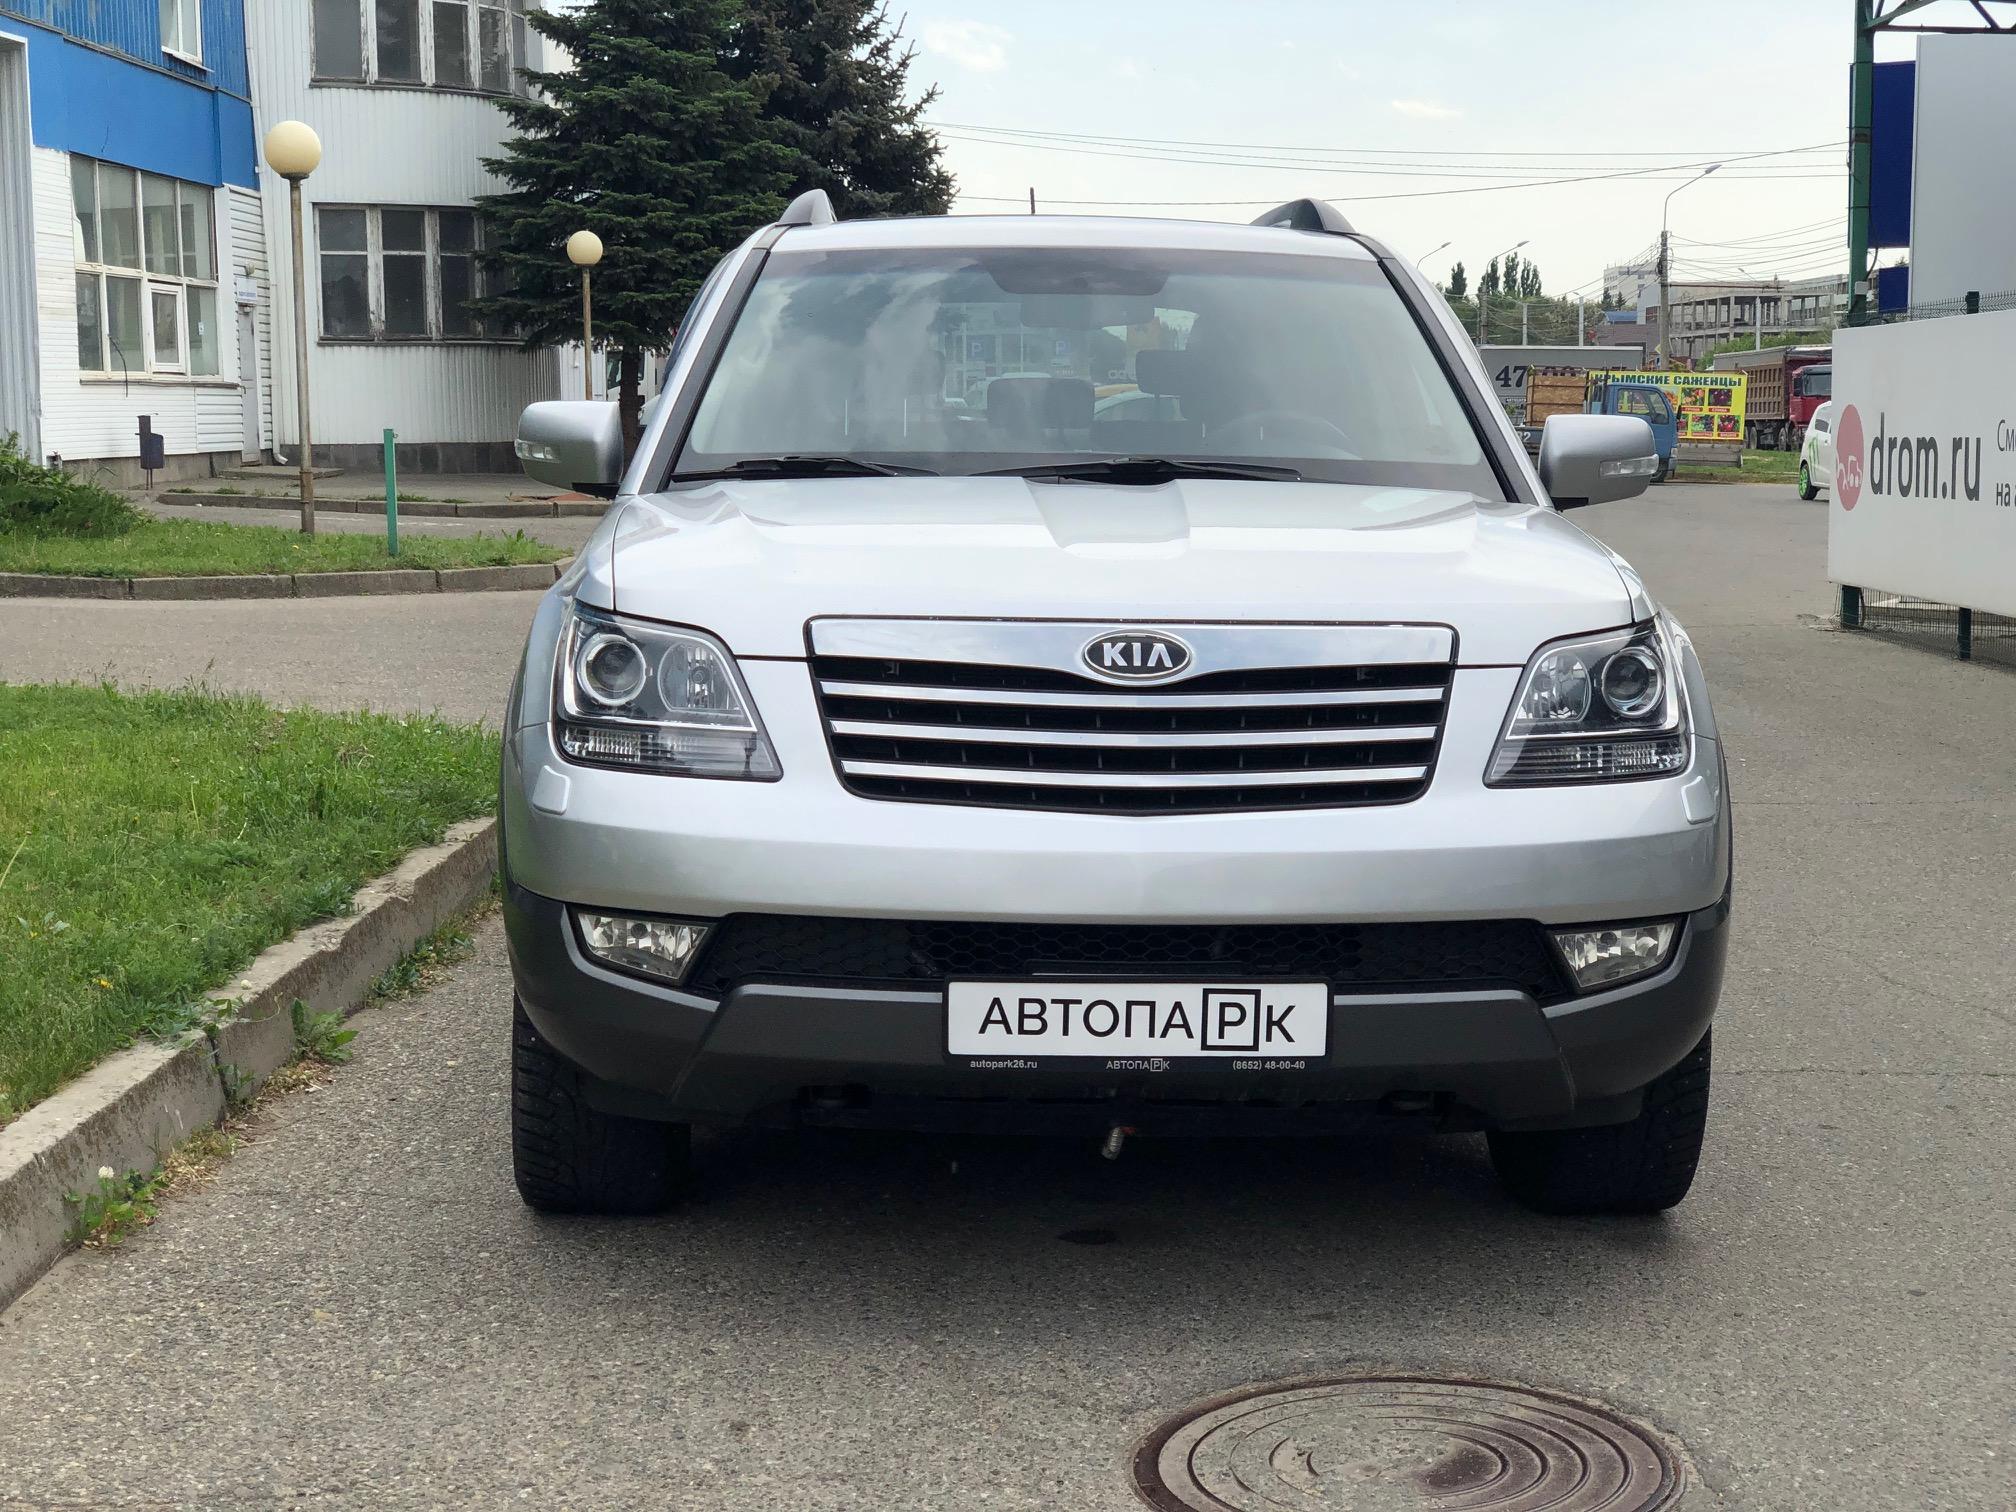 Купить KIA Mohave (Белый) - Автопарк Ставрополь